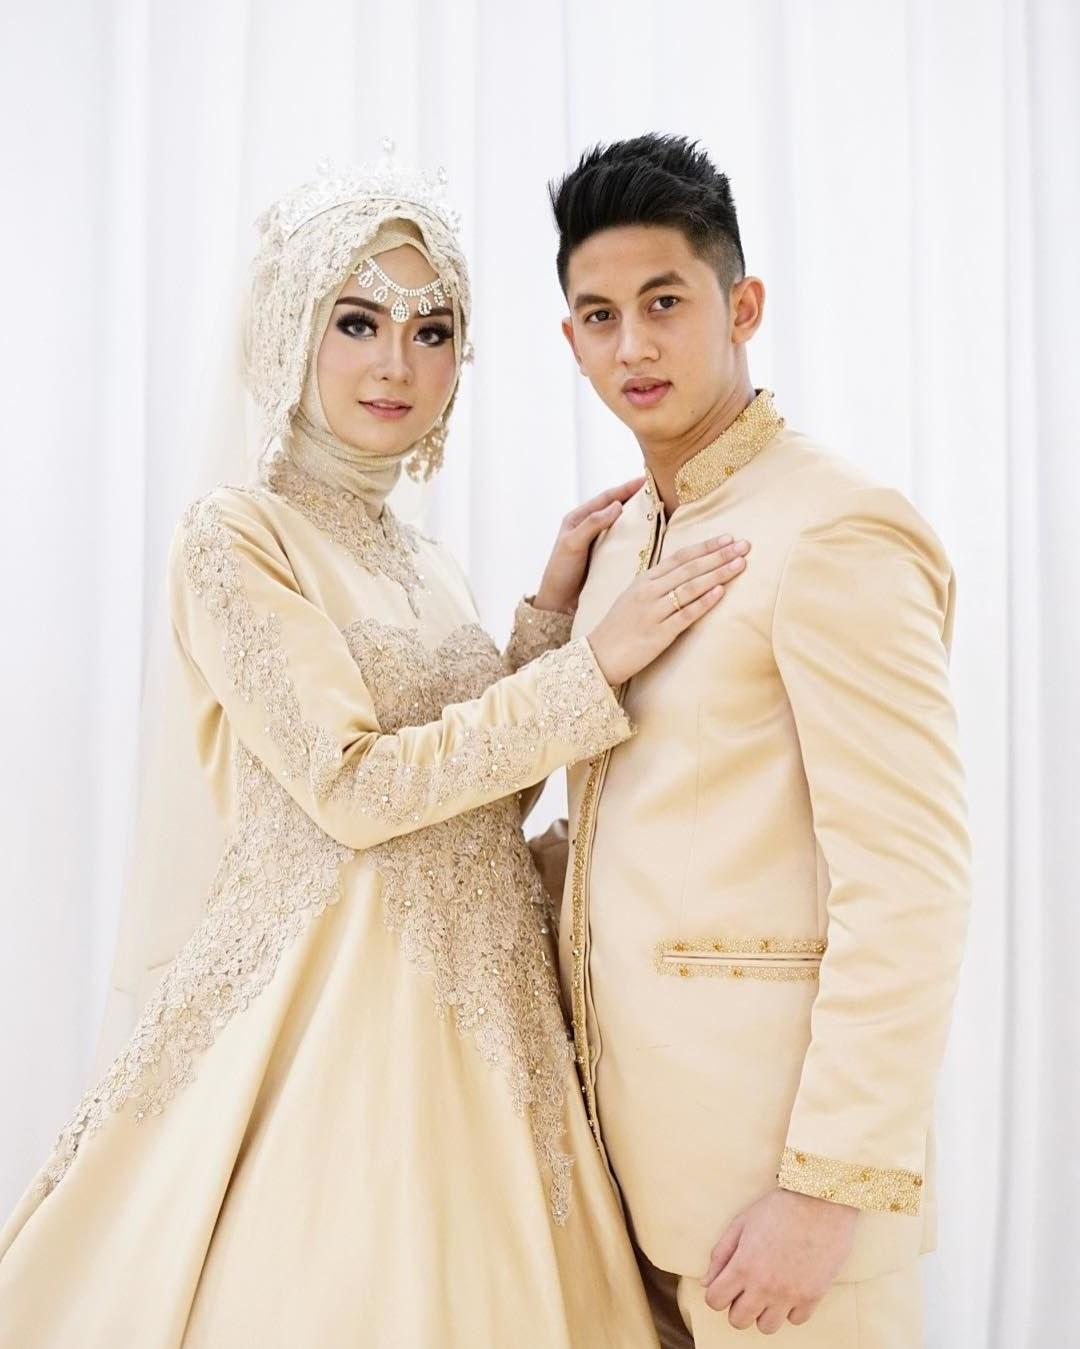 Ide Baju Pengantin Sederhana Muslimah Irdz Contoh Desain Baju Pengantin Muslimah Desain Pernikahan